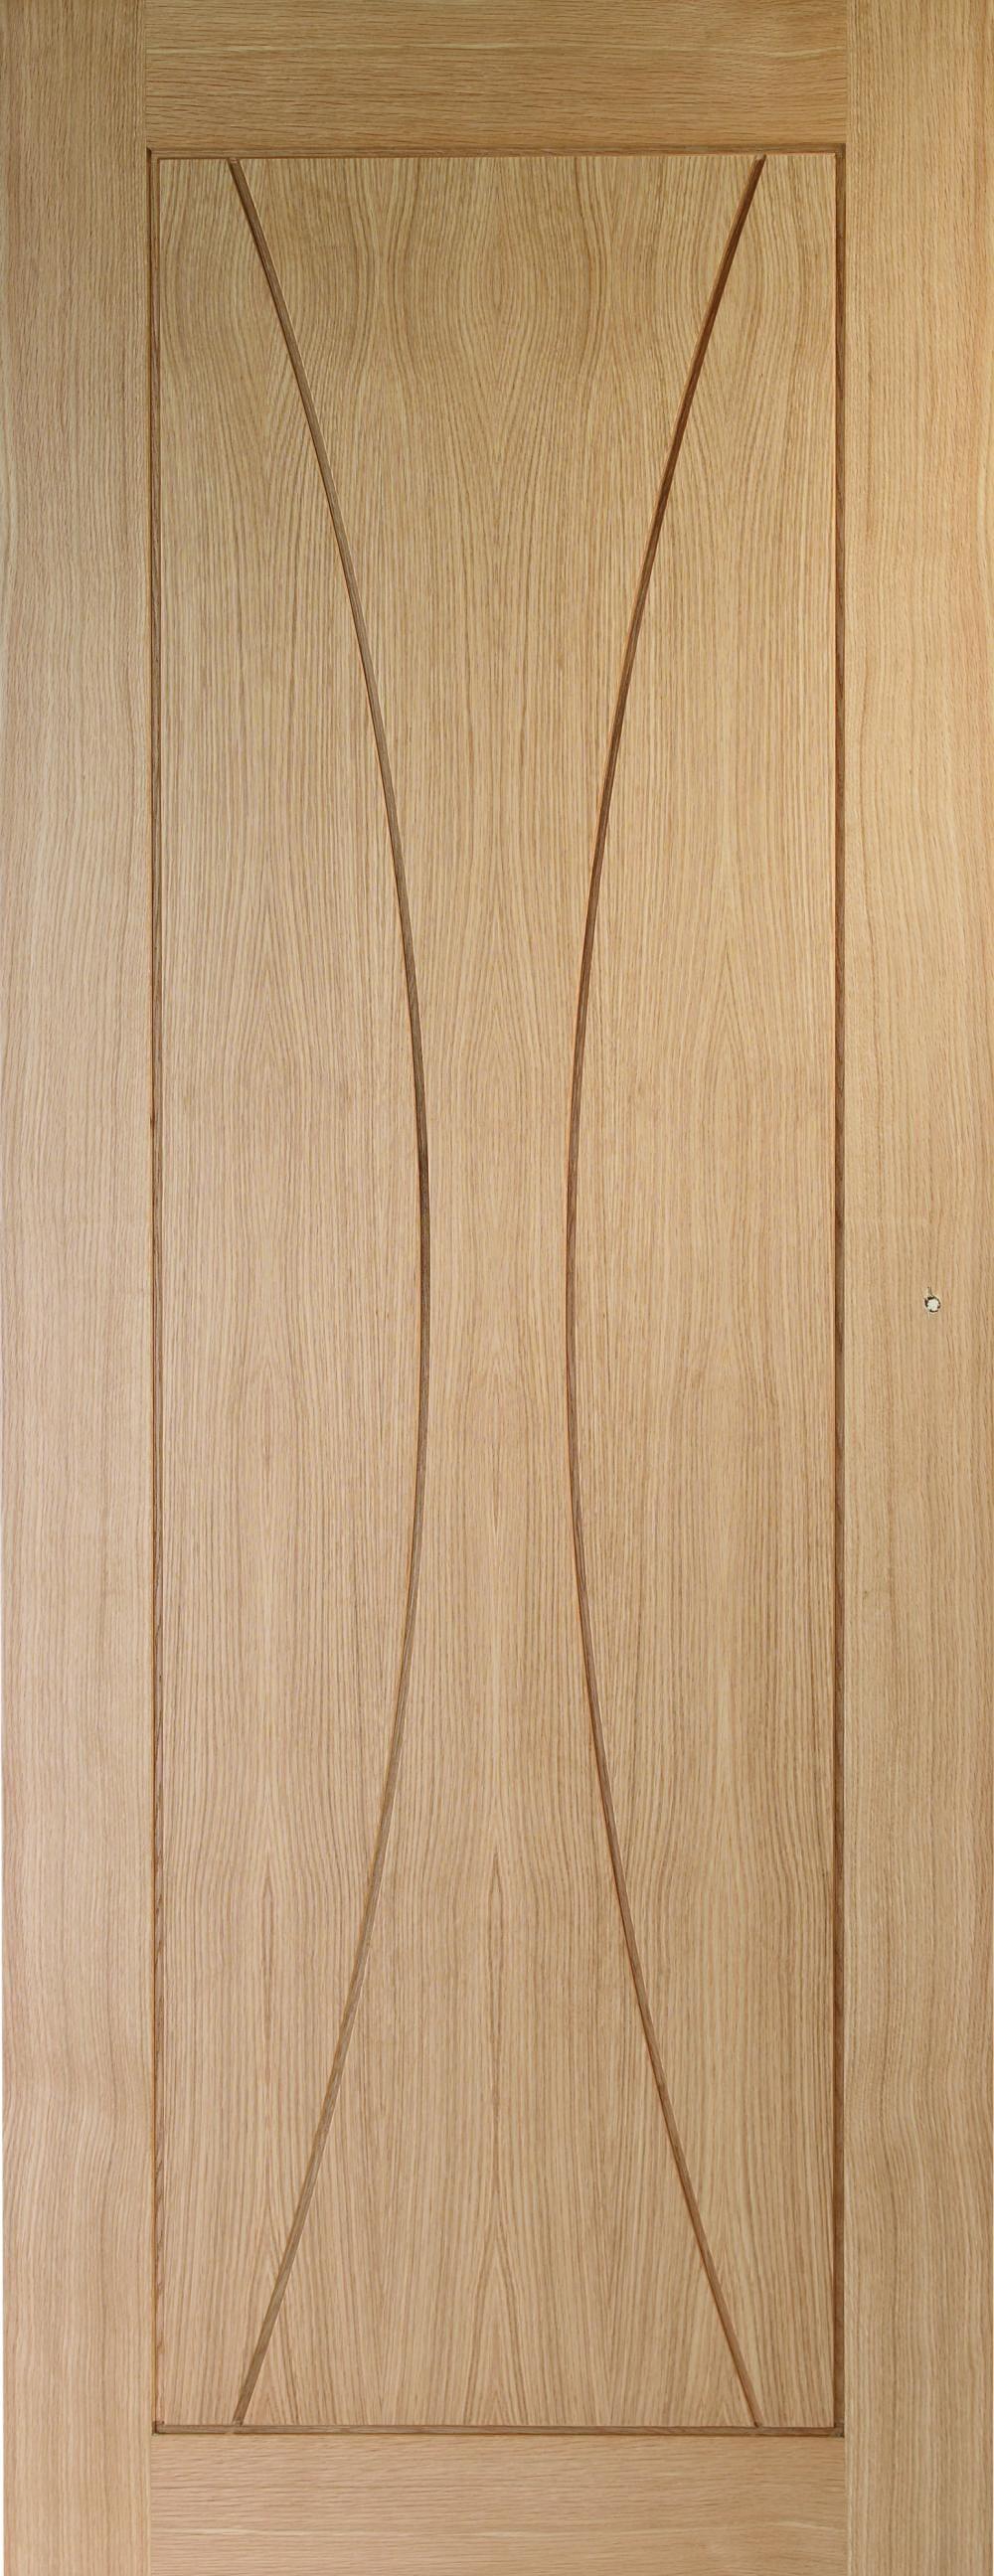 Verona Oak - Prefinished  Image